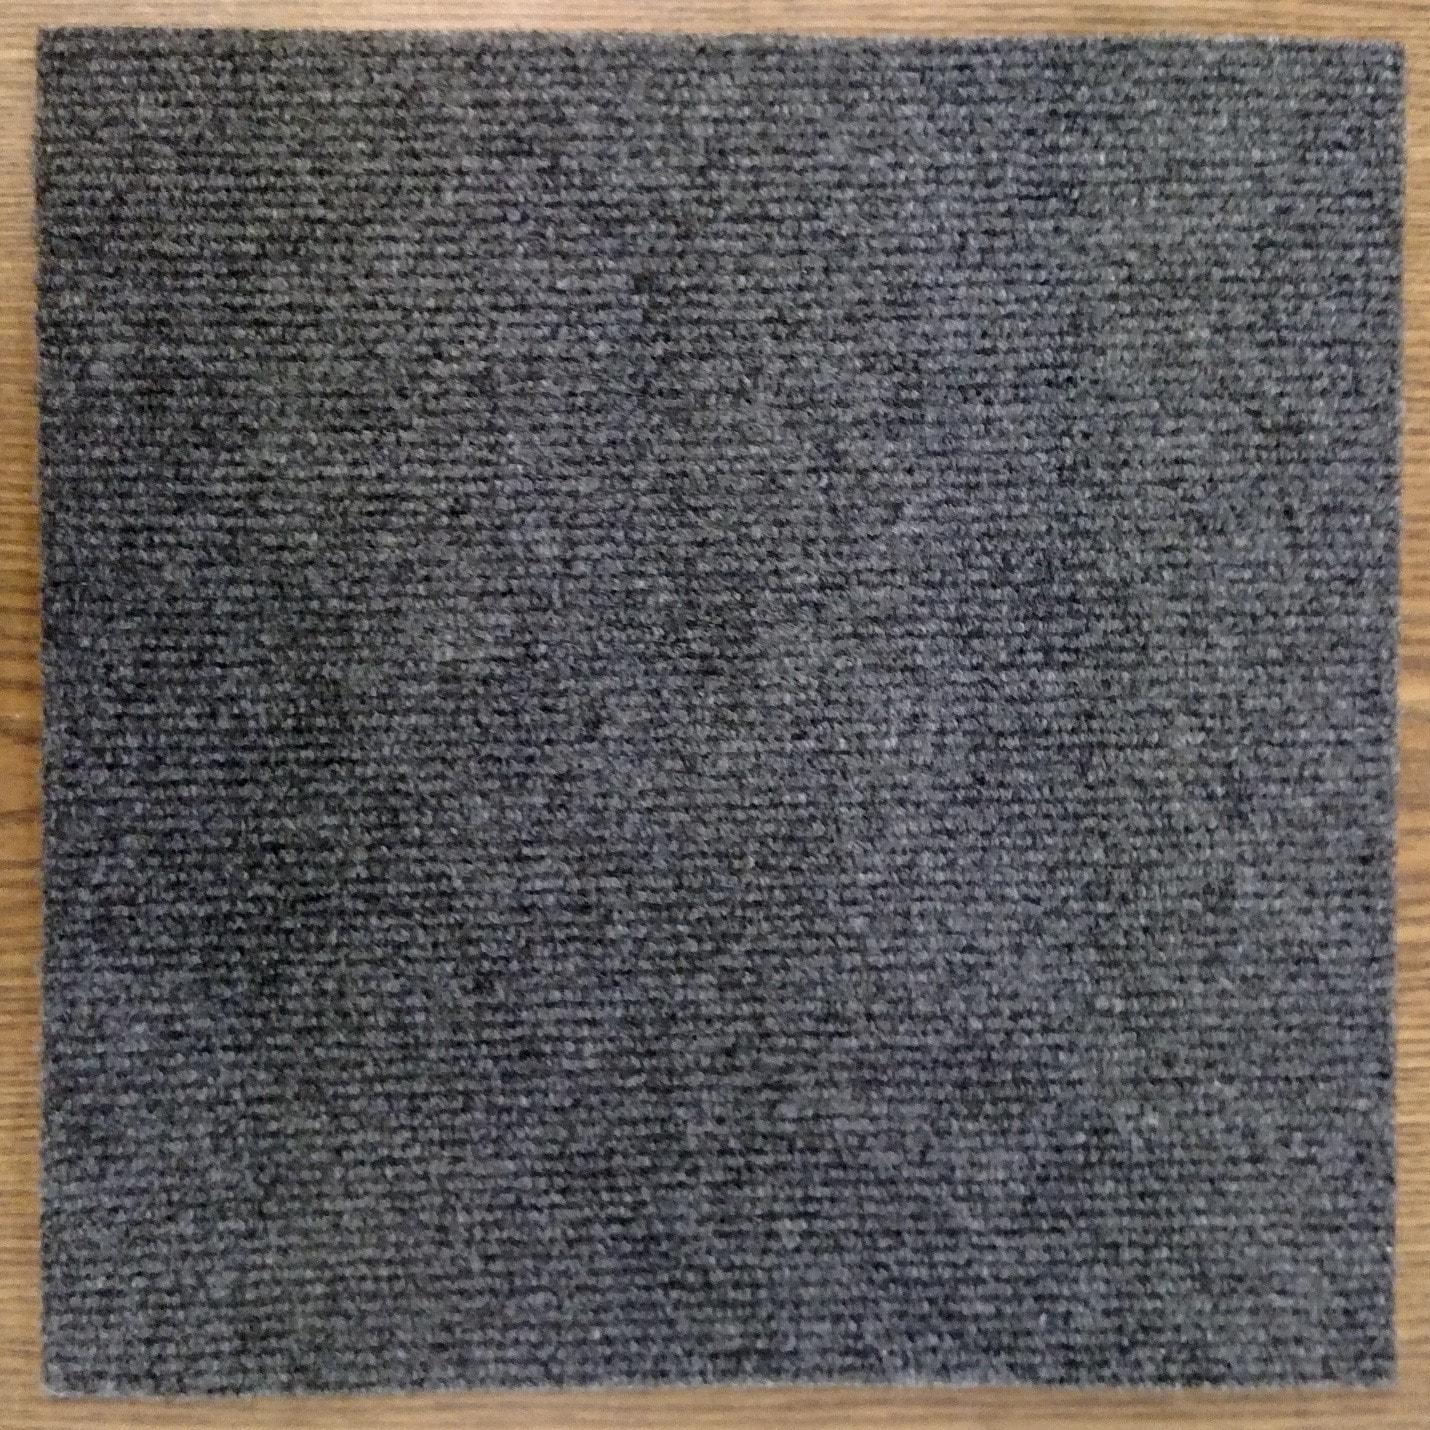 Homeworx Peel and Stick 144 sq. ft. Charcoal Grey Carpet Tiles